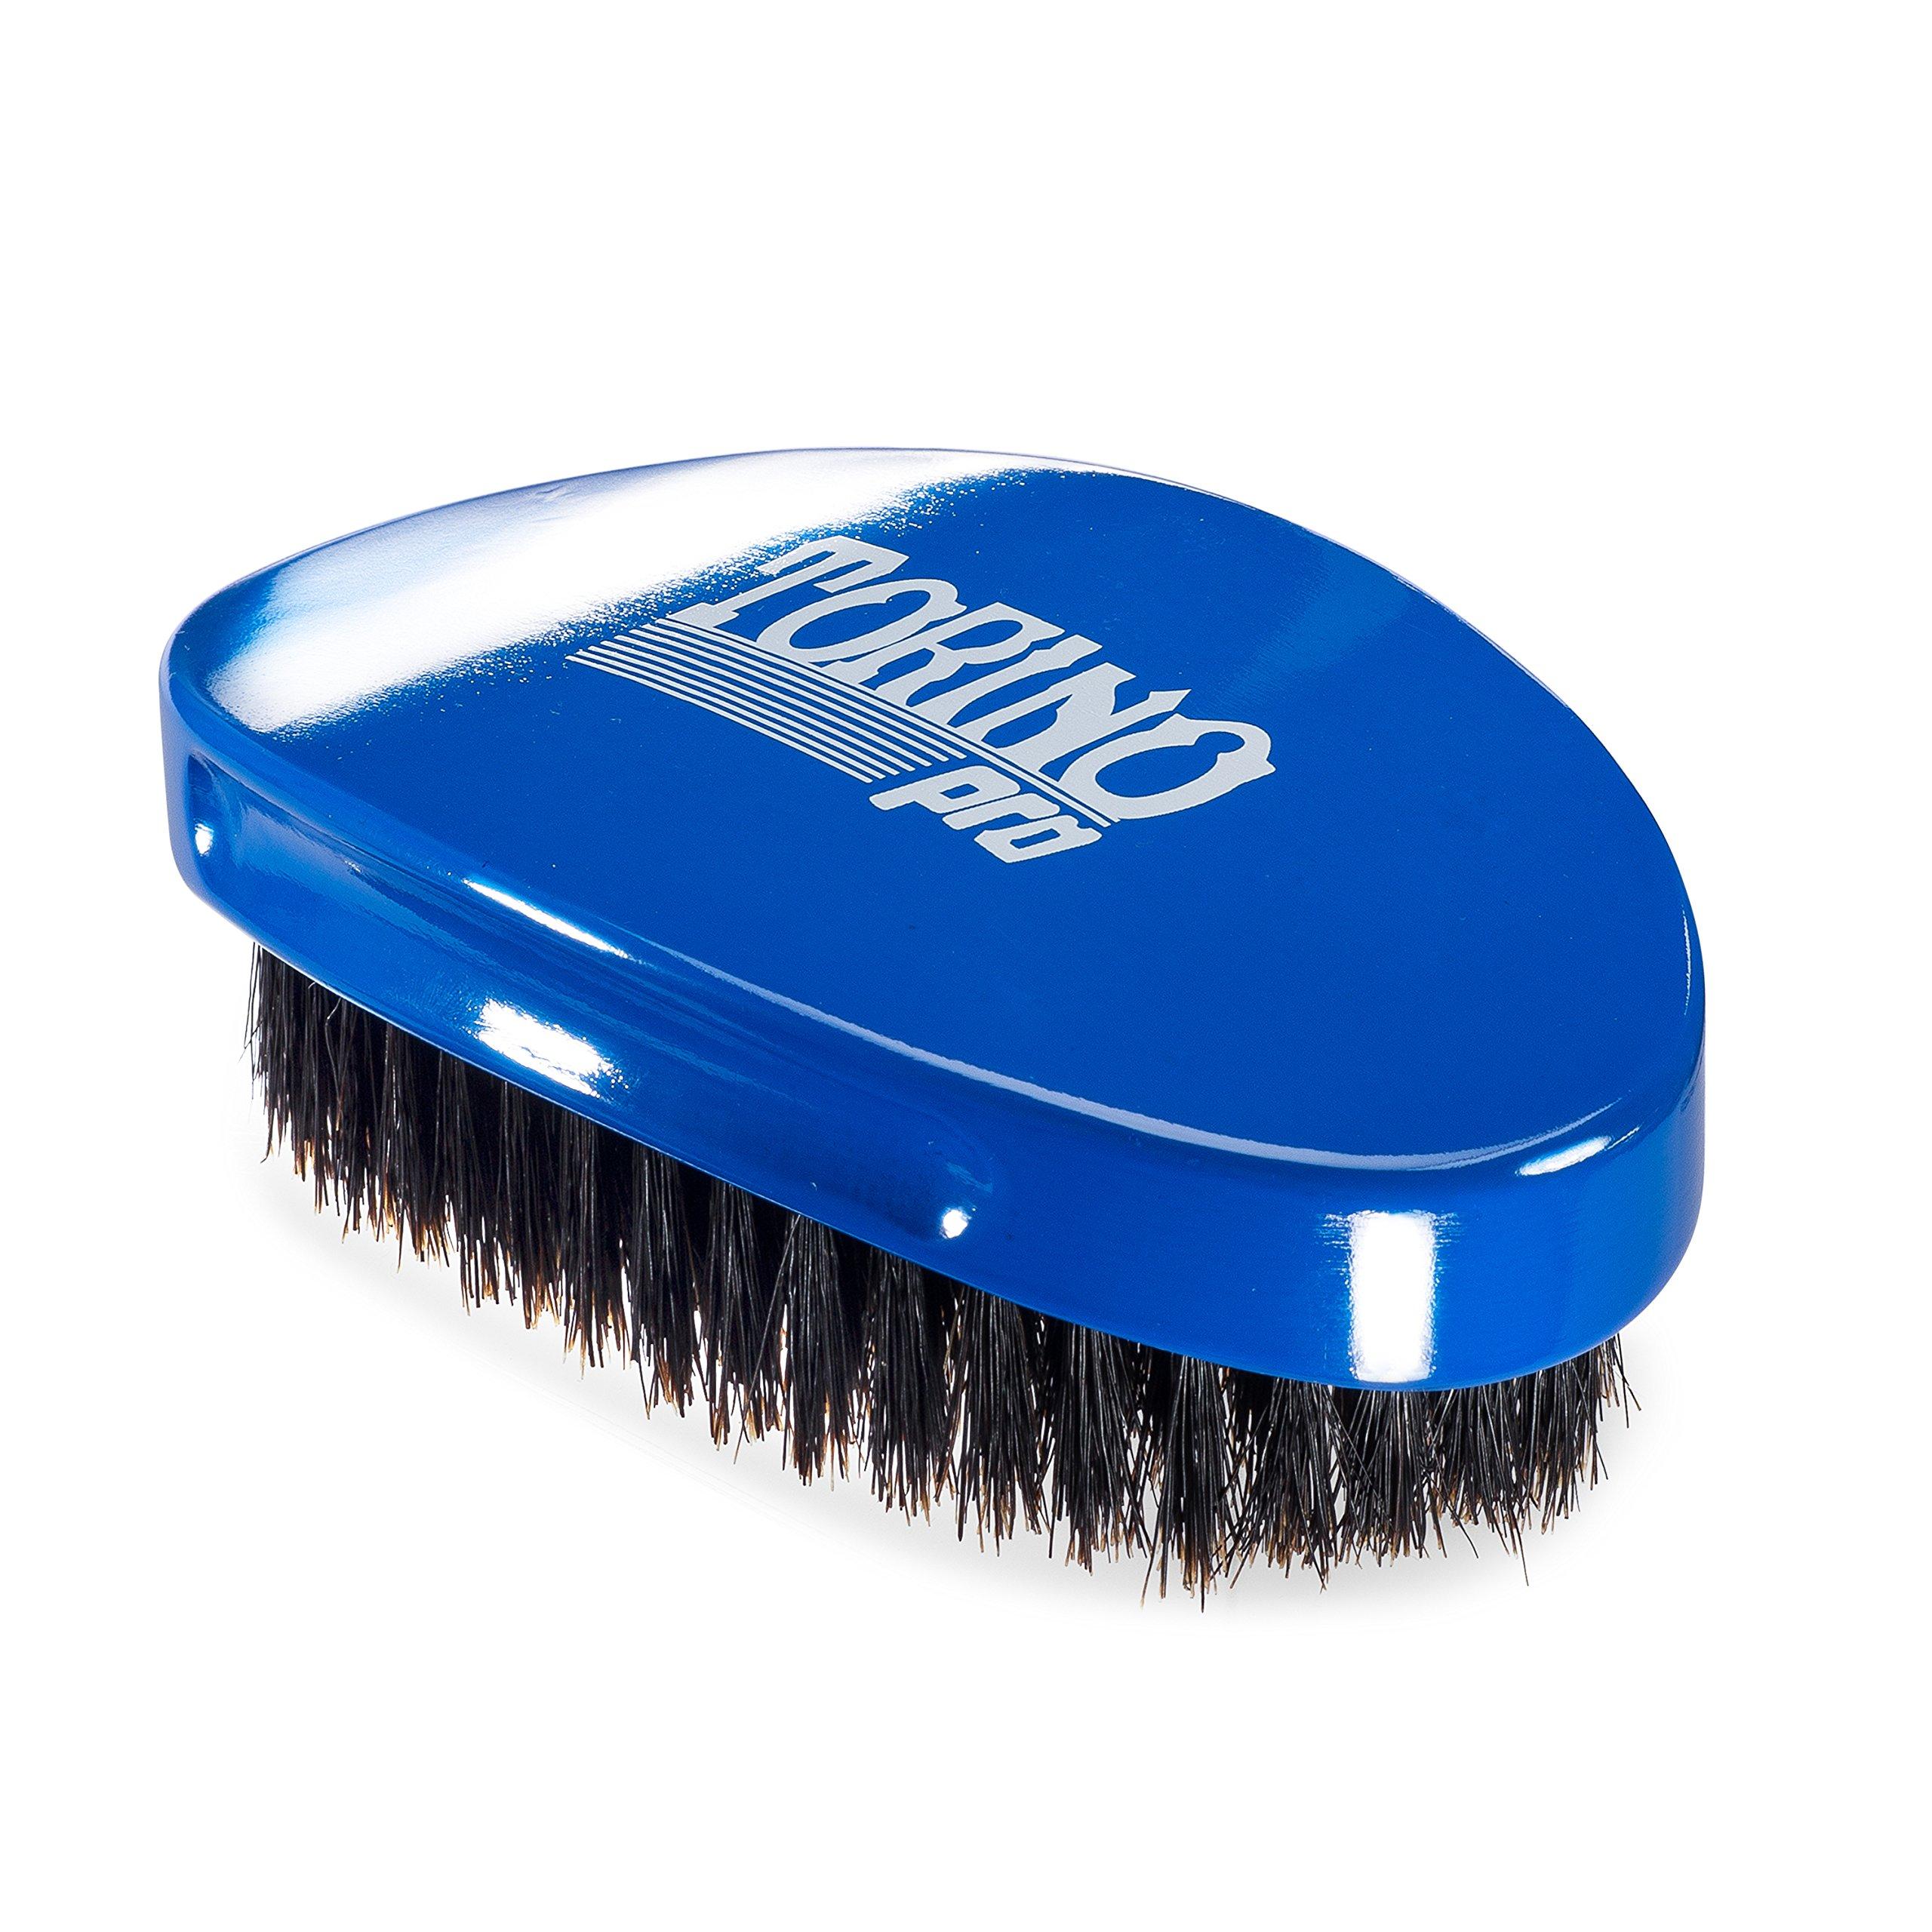 Torino Pro Wave Brush #720 By Brush King - Medium Soft Curve 360 Waves Palm Brush